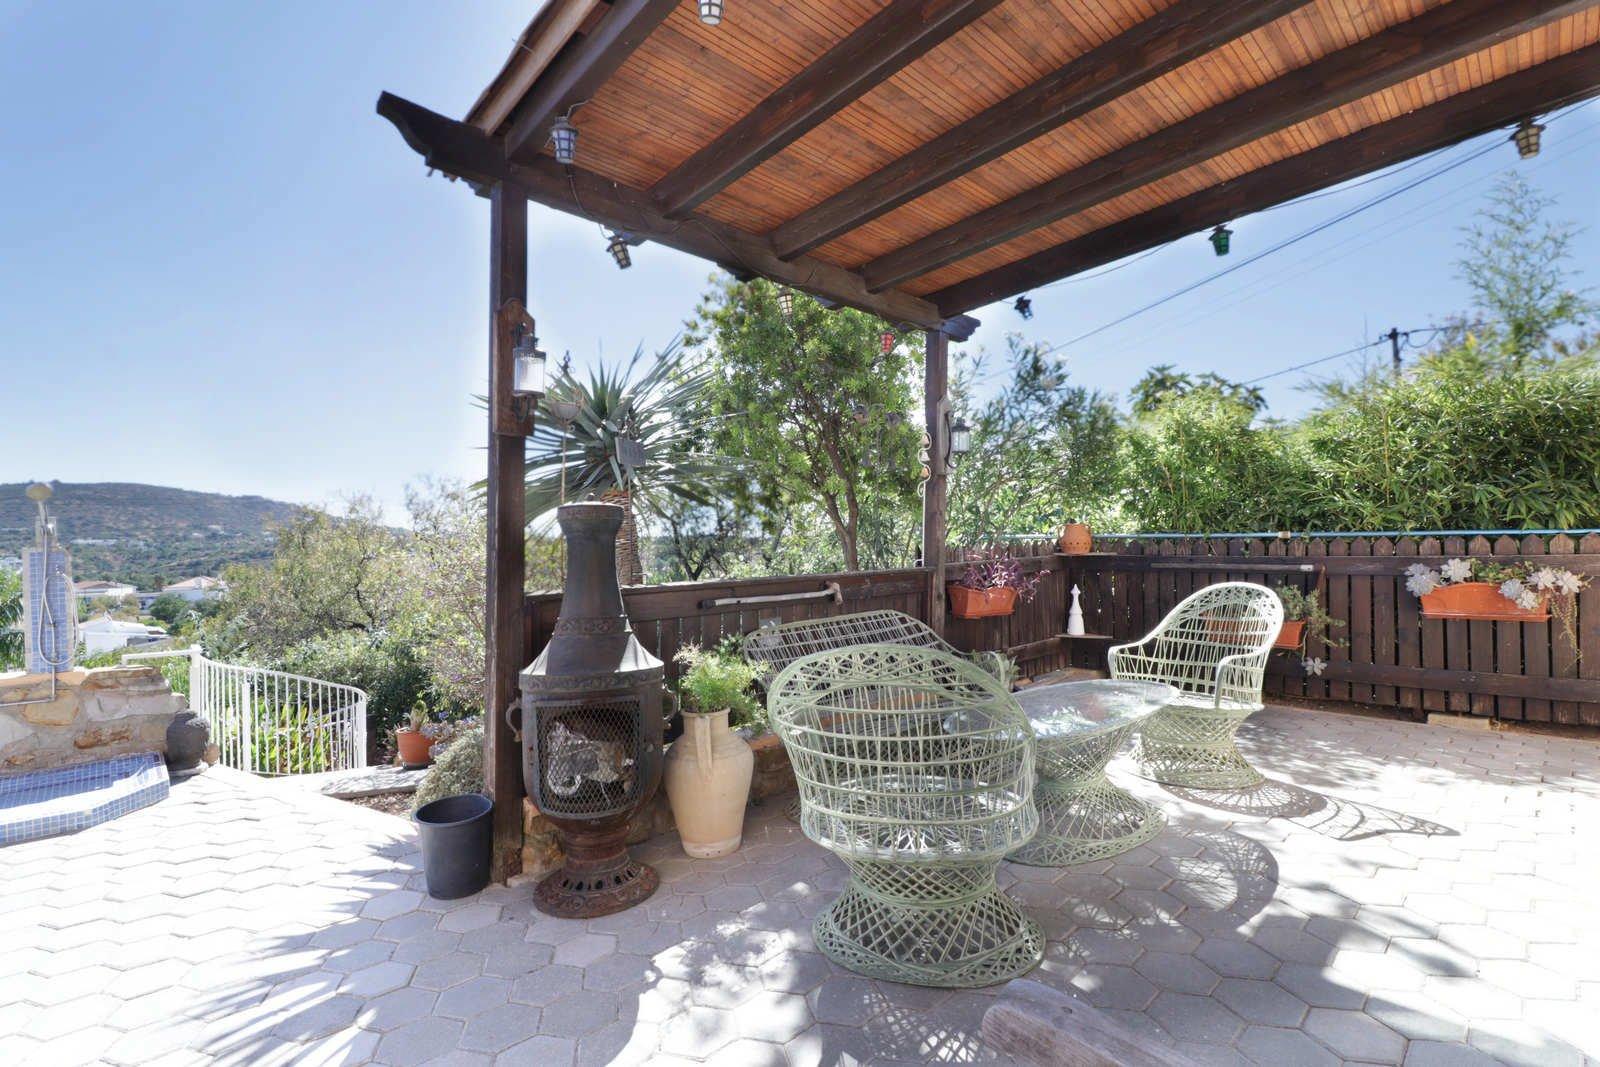 3 Bedroom Villa Almancil, Central Algarve Ref: PV3643